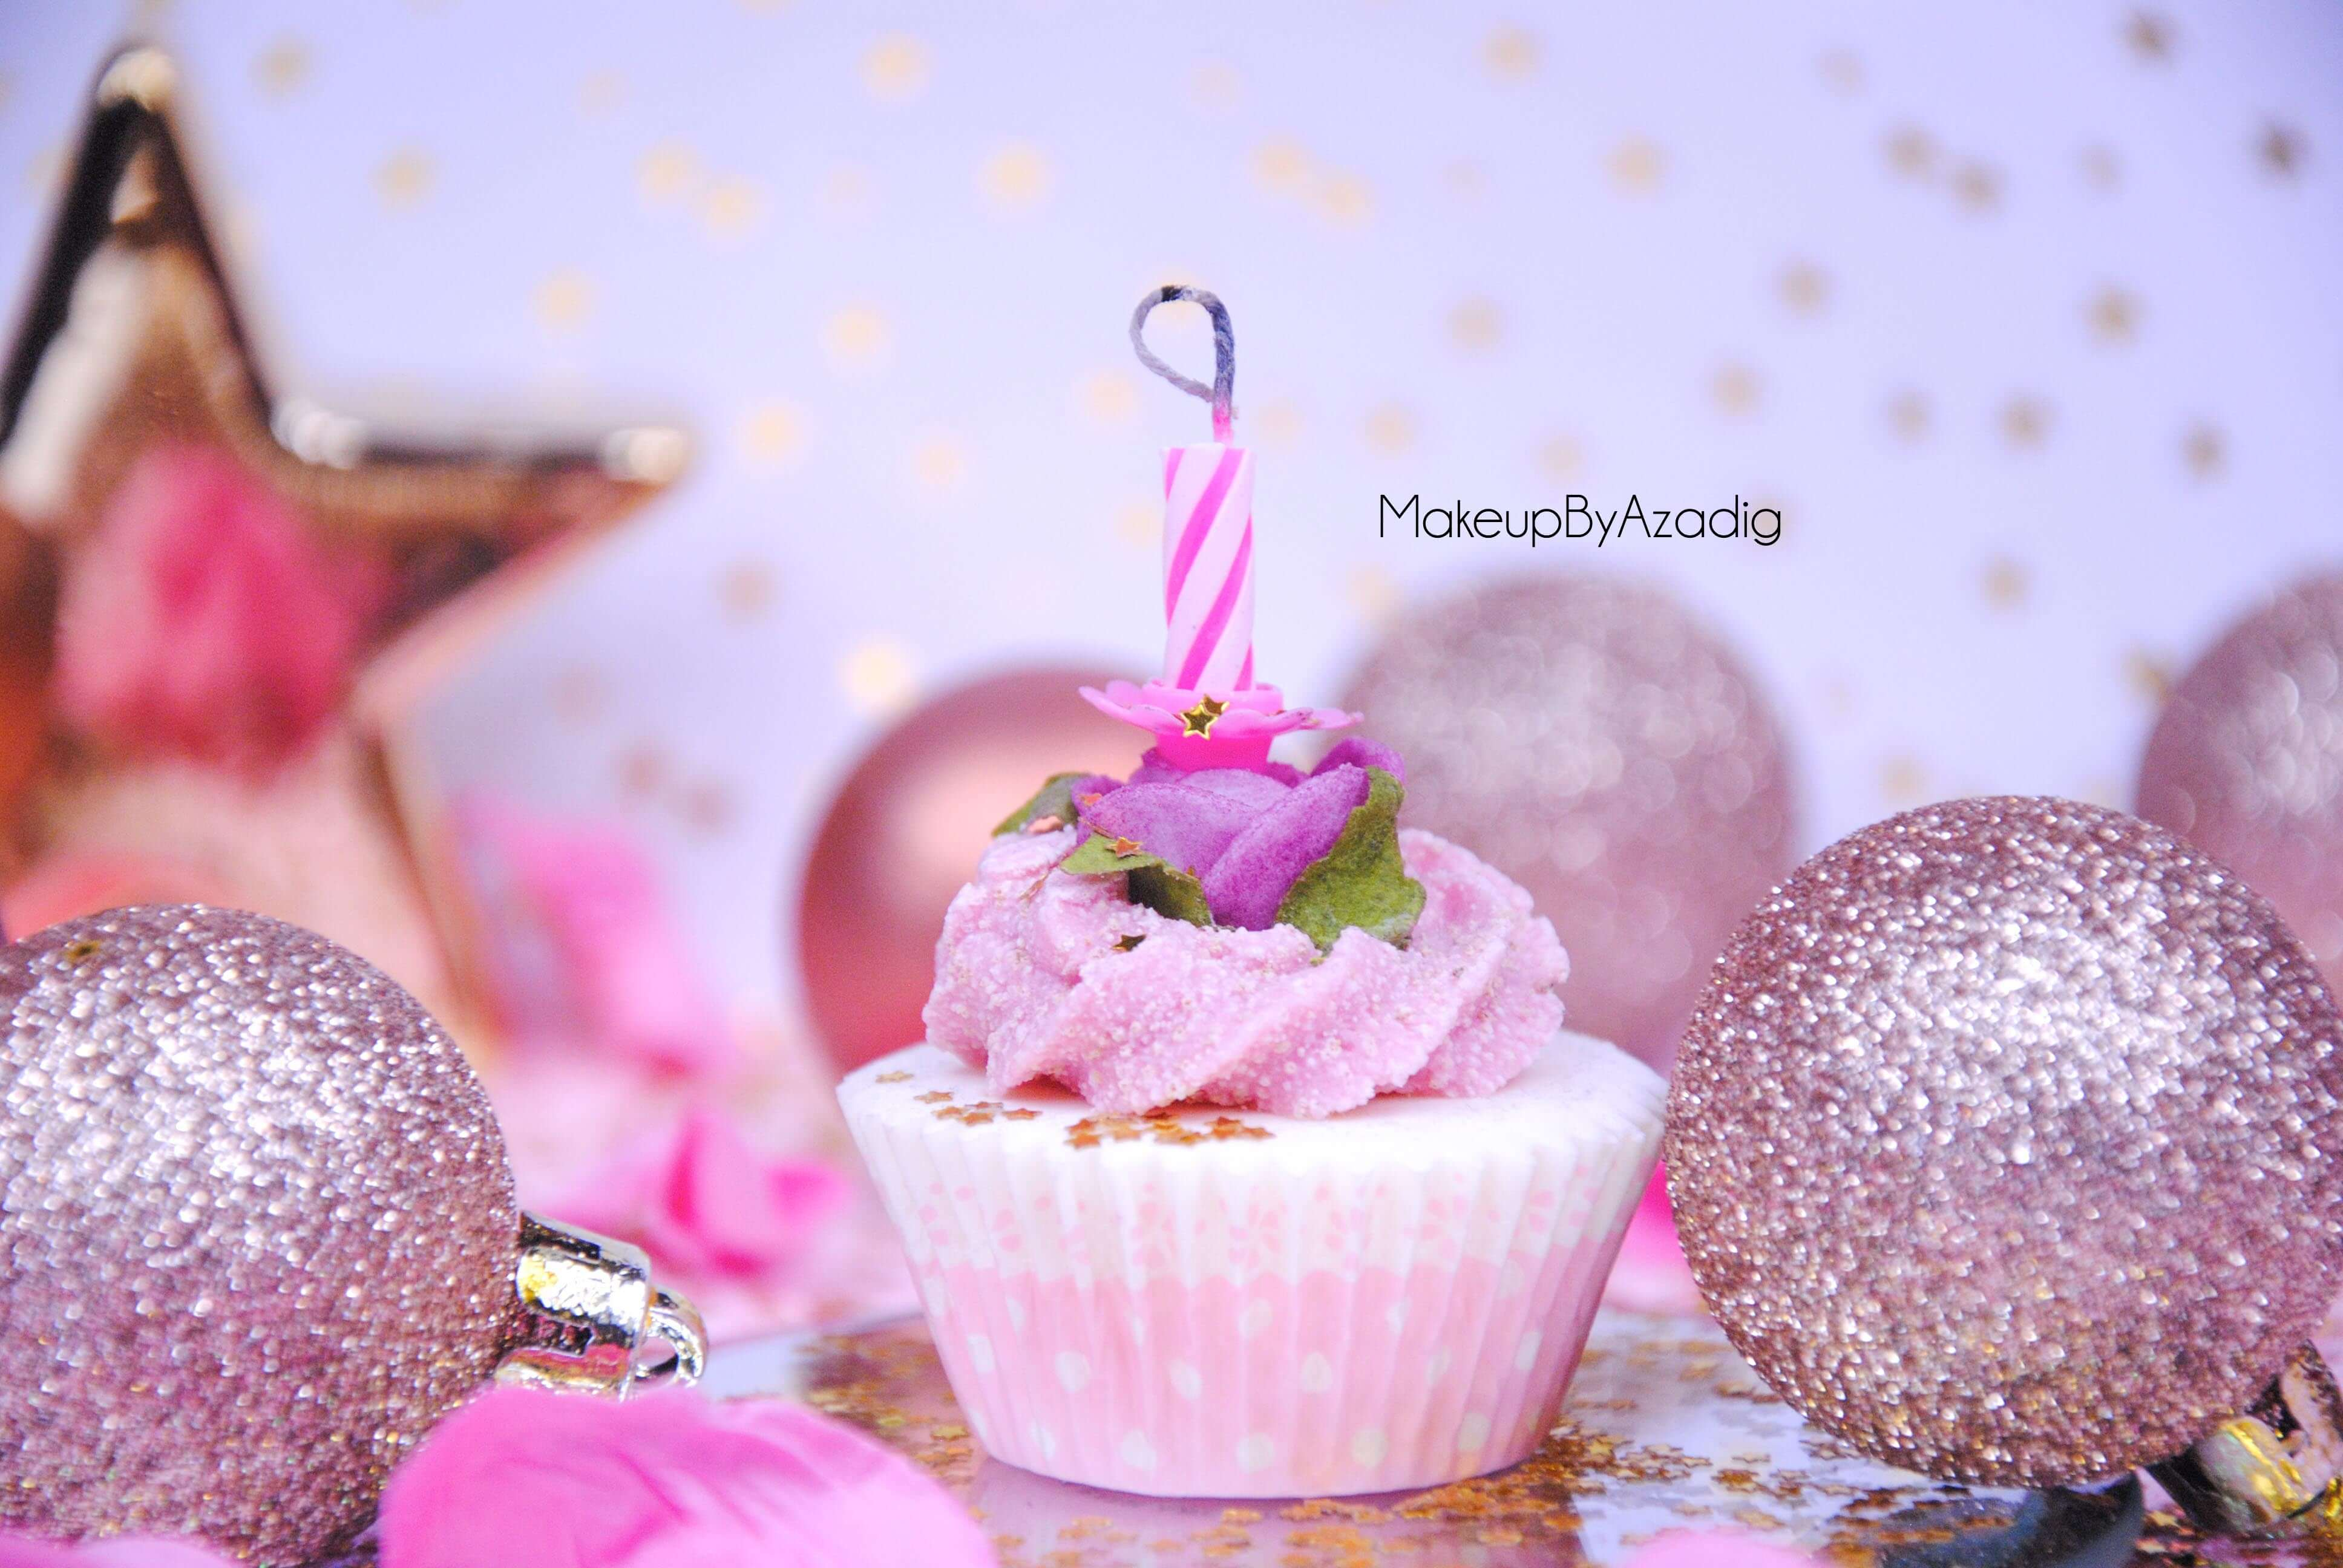 souffler-makeupbyazadig-joyeux-blog-anniversaire-influencer-troyes-paris-love